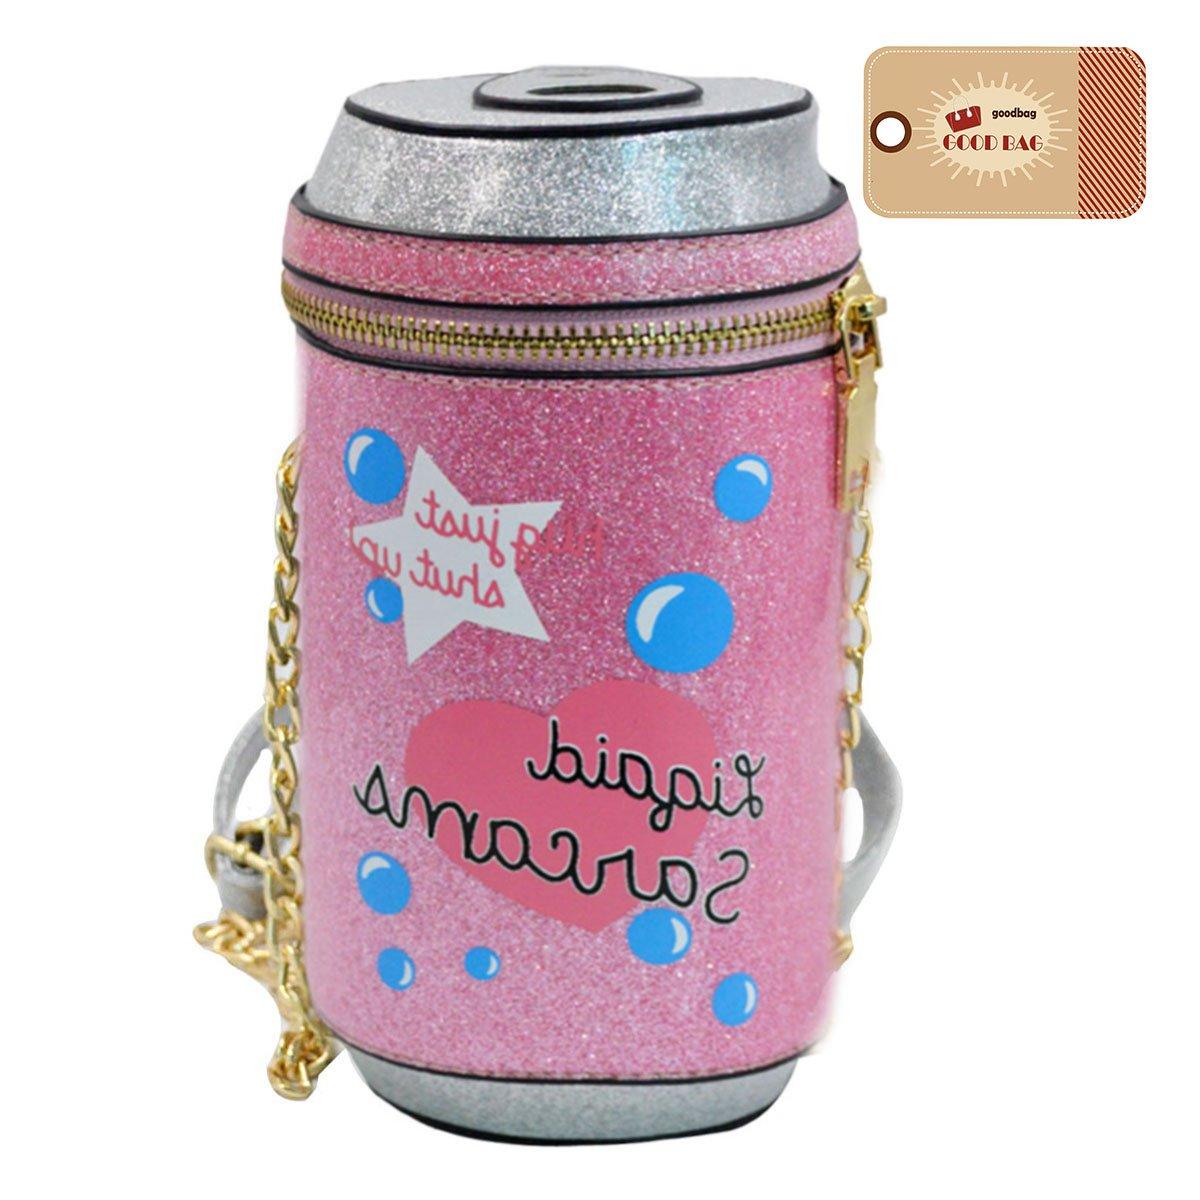 Goodbag Boutique Women Cola Bottle Shape Sparkly Purse Girls Chain Shoulder Bag Crossbody Mini Bucket Purse by Goodbag Boutique (Image #1)